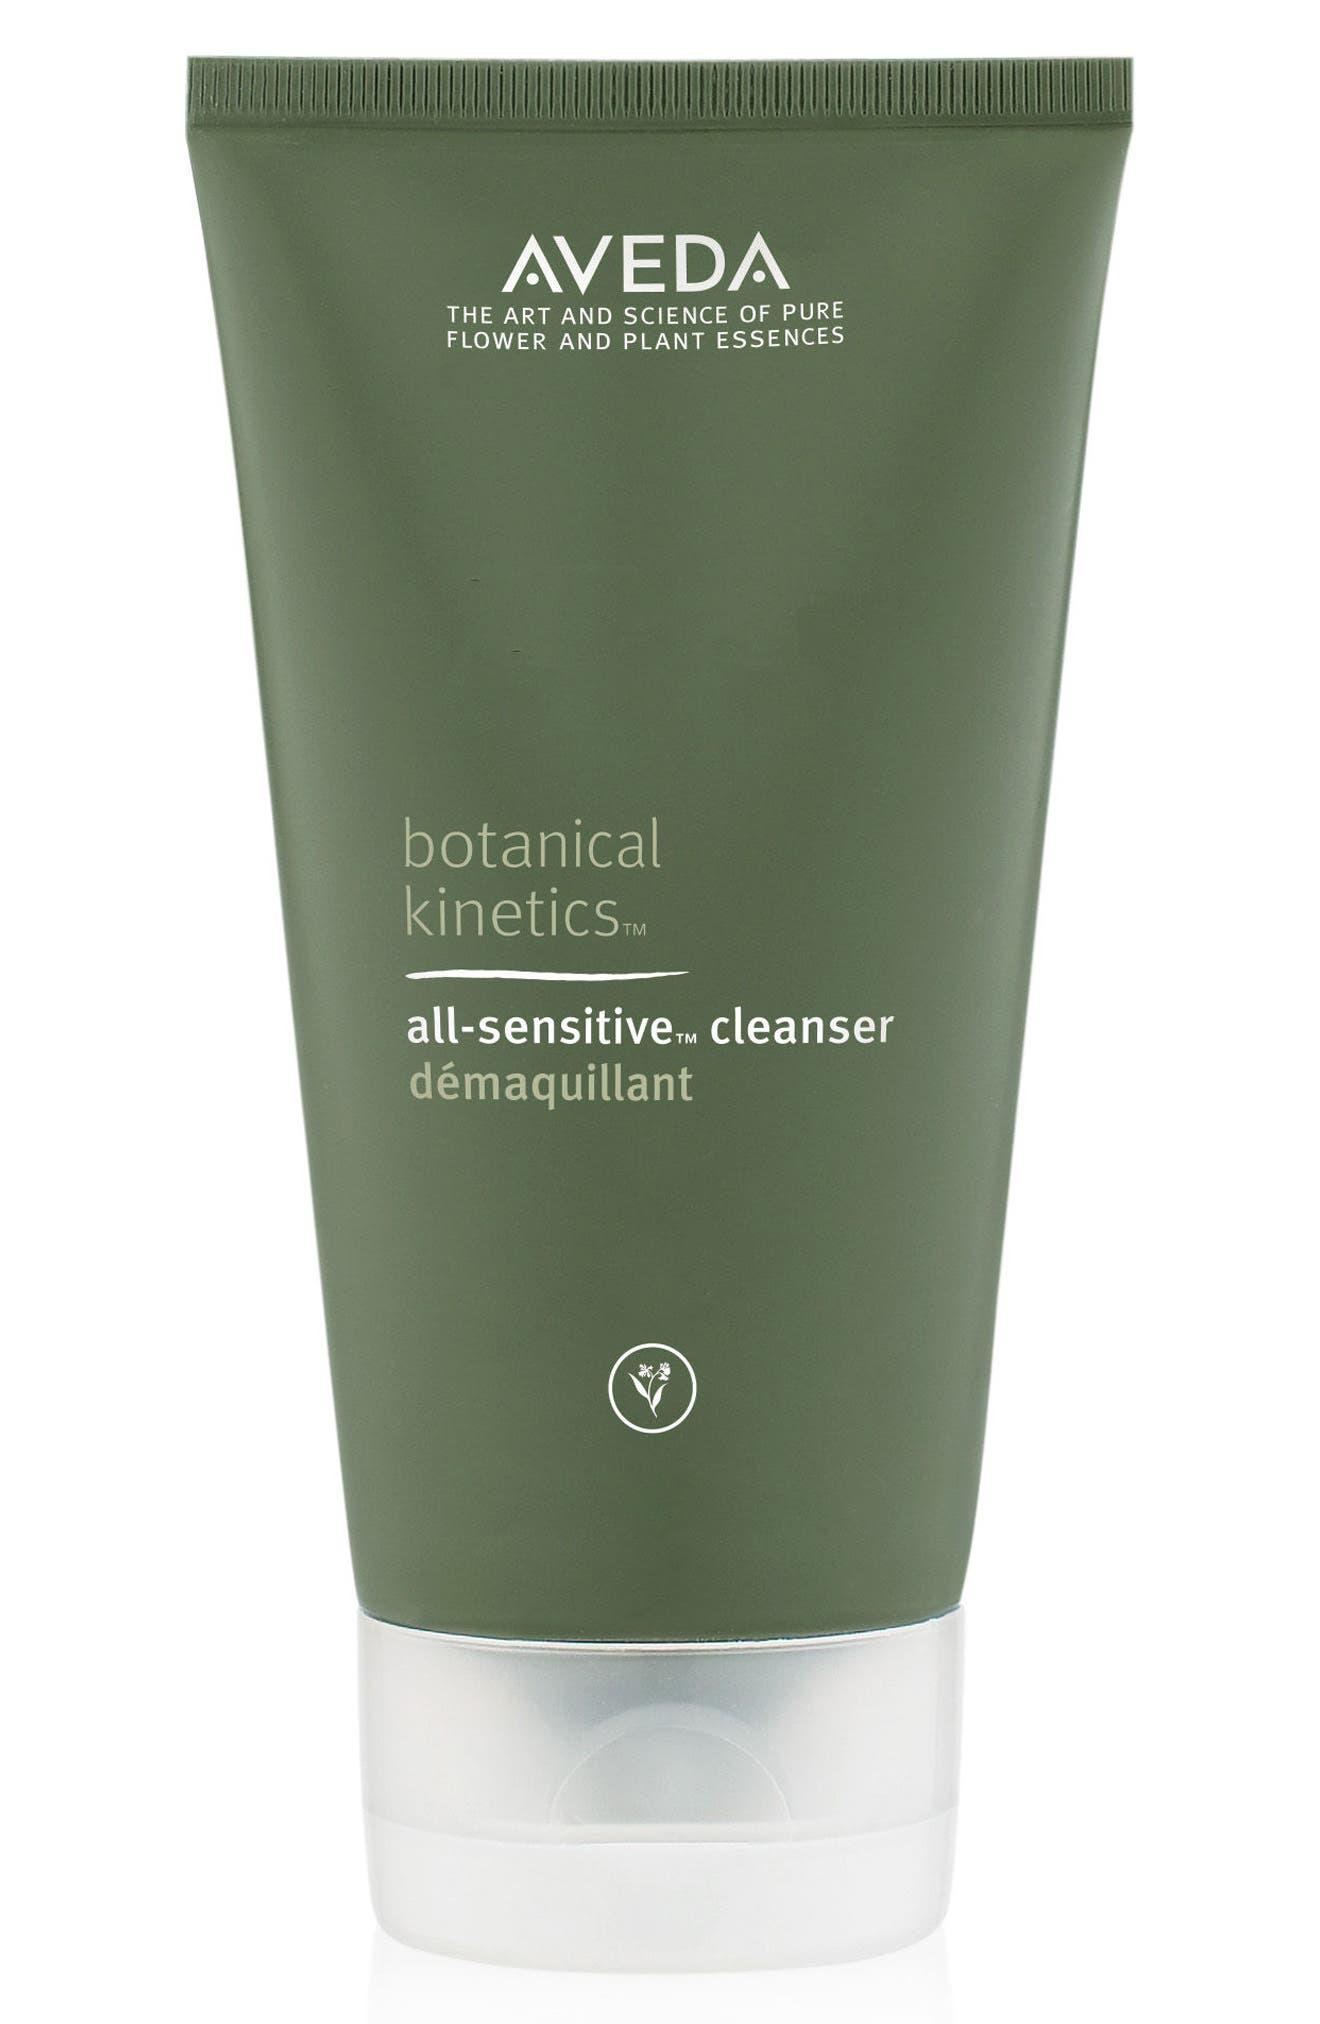 Aveda botanical kinetics™ All-Sensitive Cleanser